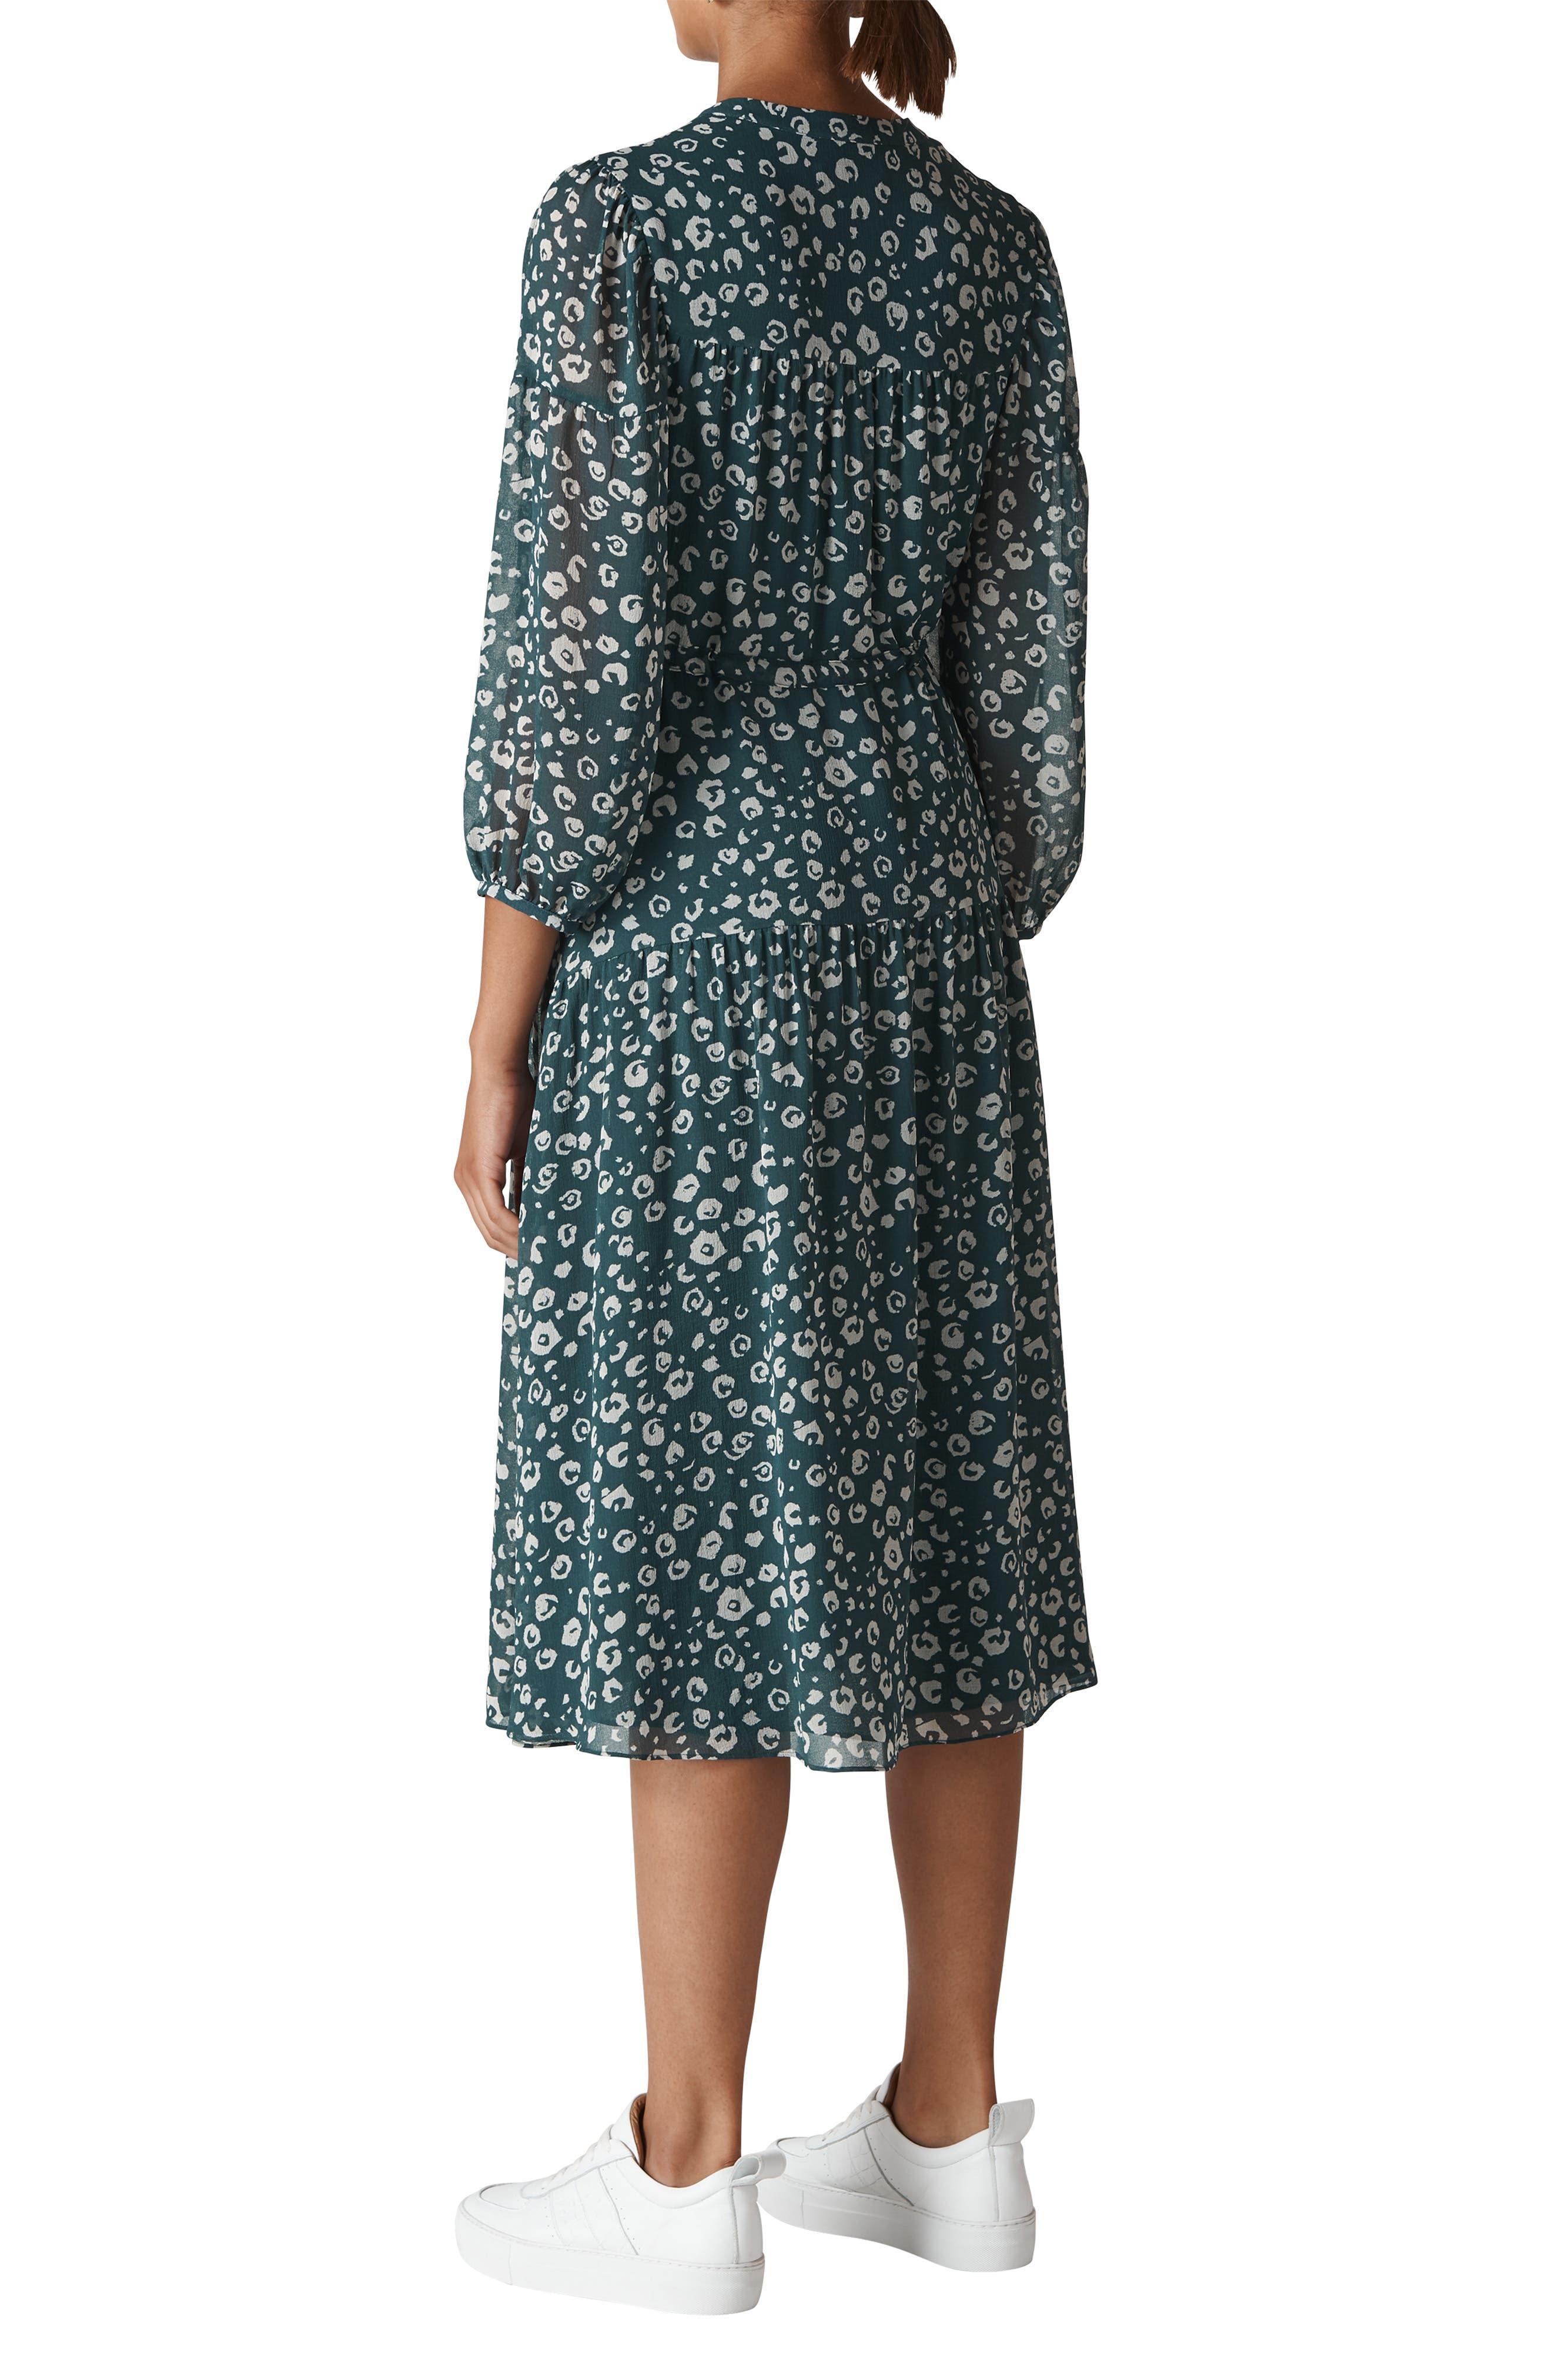 Adrianna Cheetah Print Midi Dress,                             Alternate thumbnail 2, color,                             GREEN/ MULTI